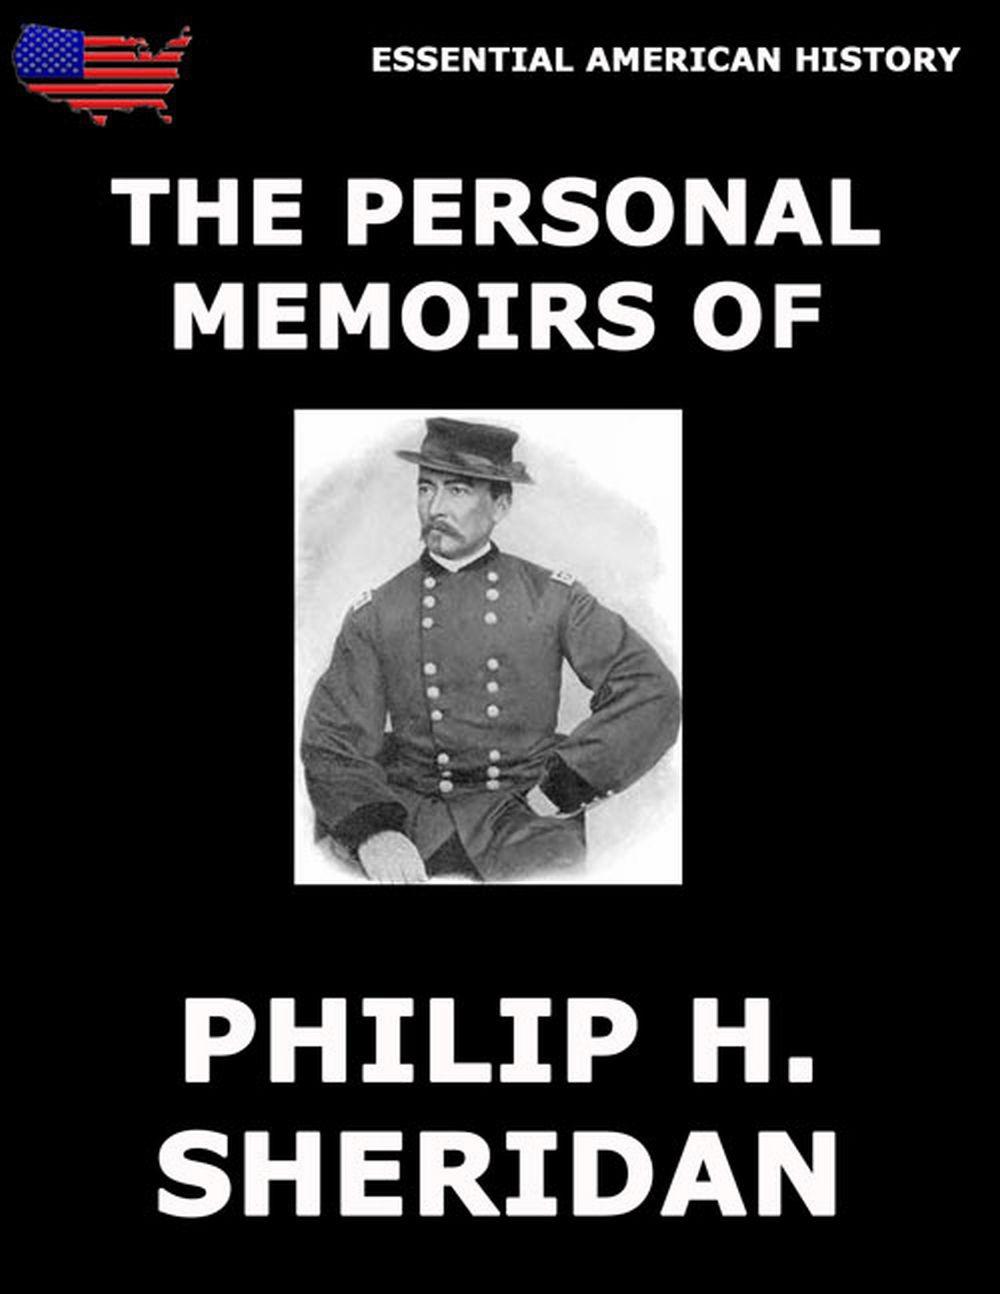 P. H. Sheridan The Personal Memoirs Of P. H. Sheridan lynette sheridan burns understanding journalism